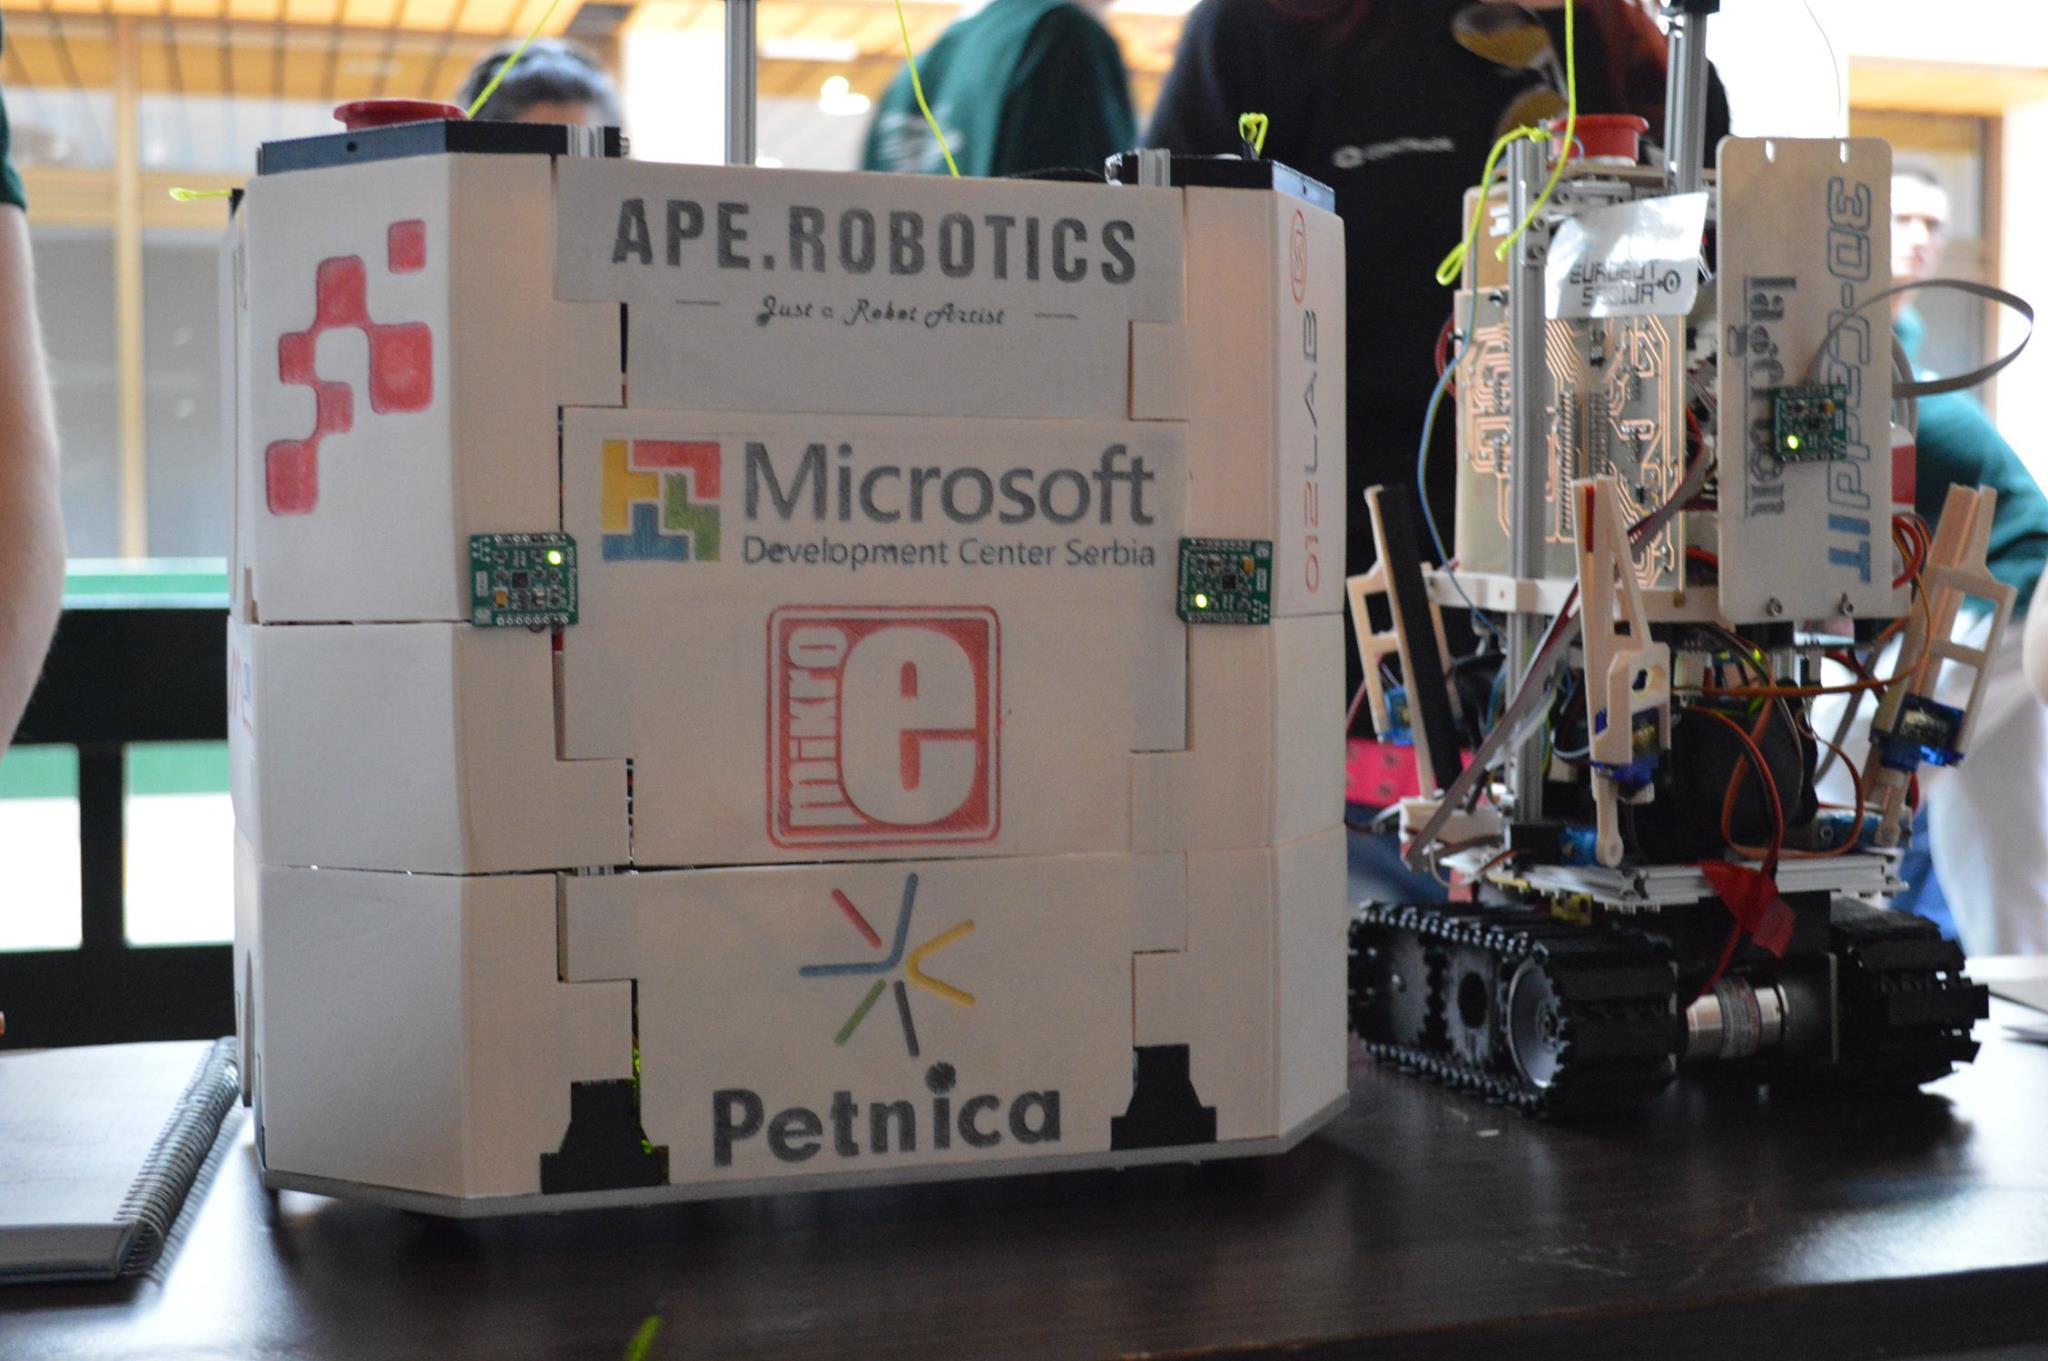 APE Robotics robot